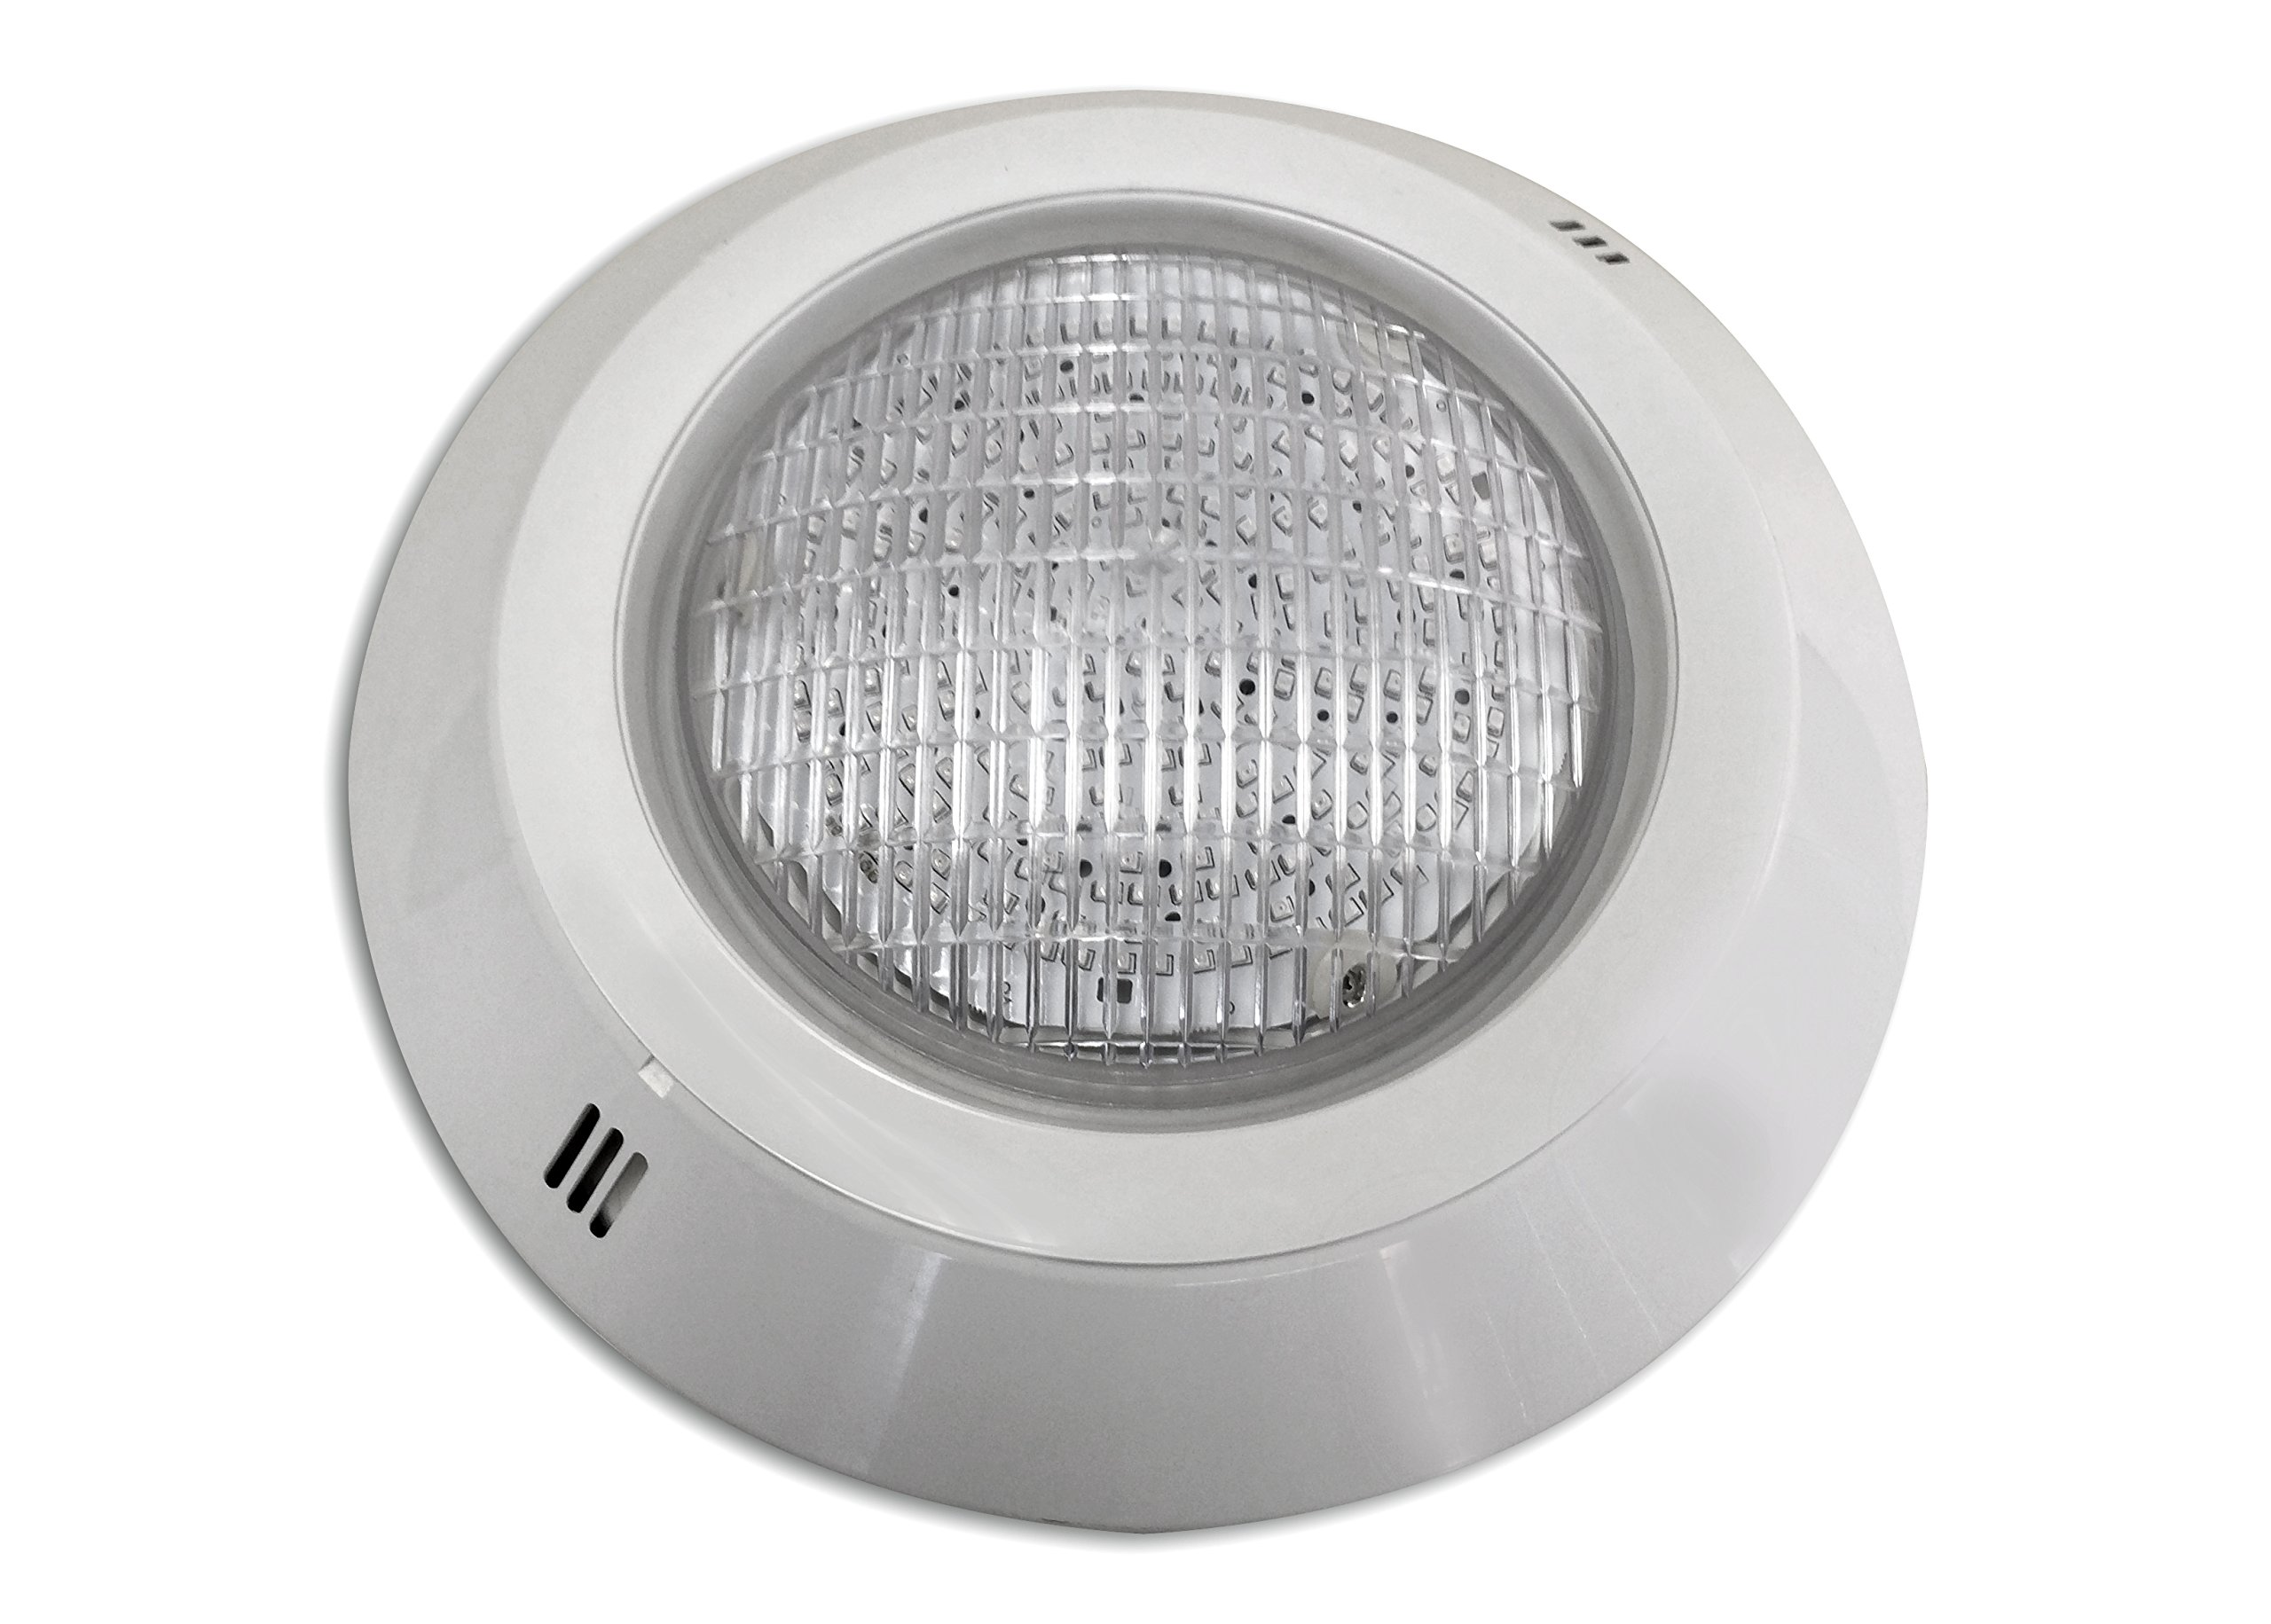 Productos QP 500384FC - PROYECTOR EXTRAPLANO LED Colores con Mando ...